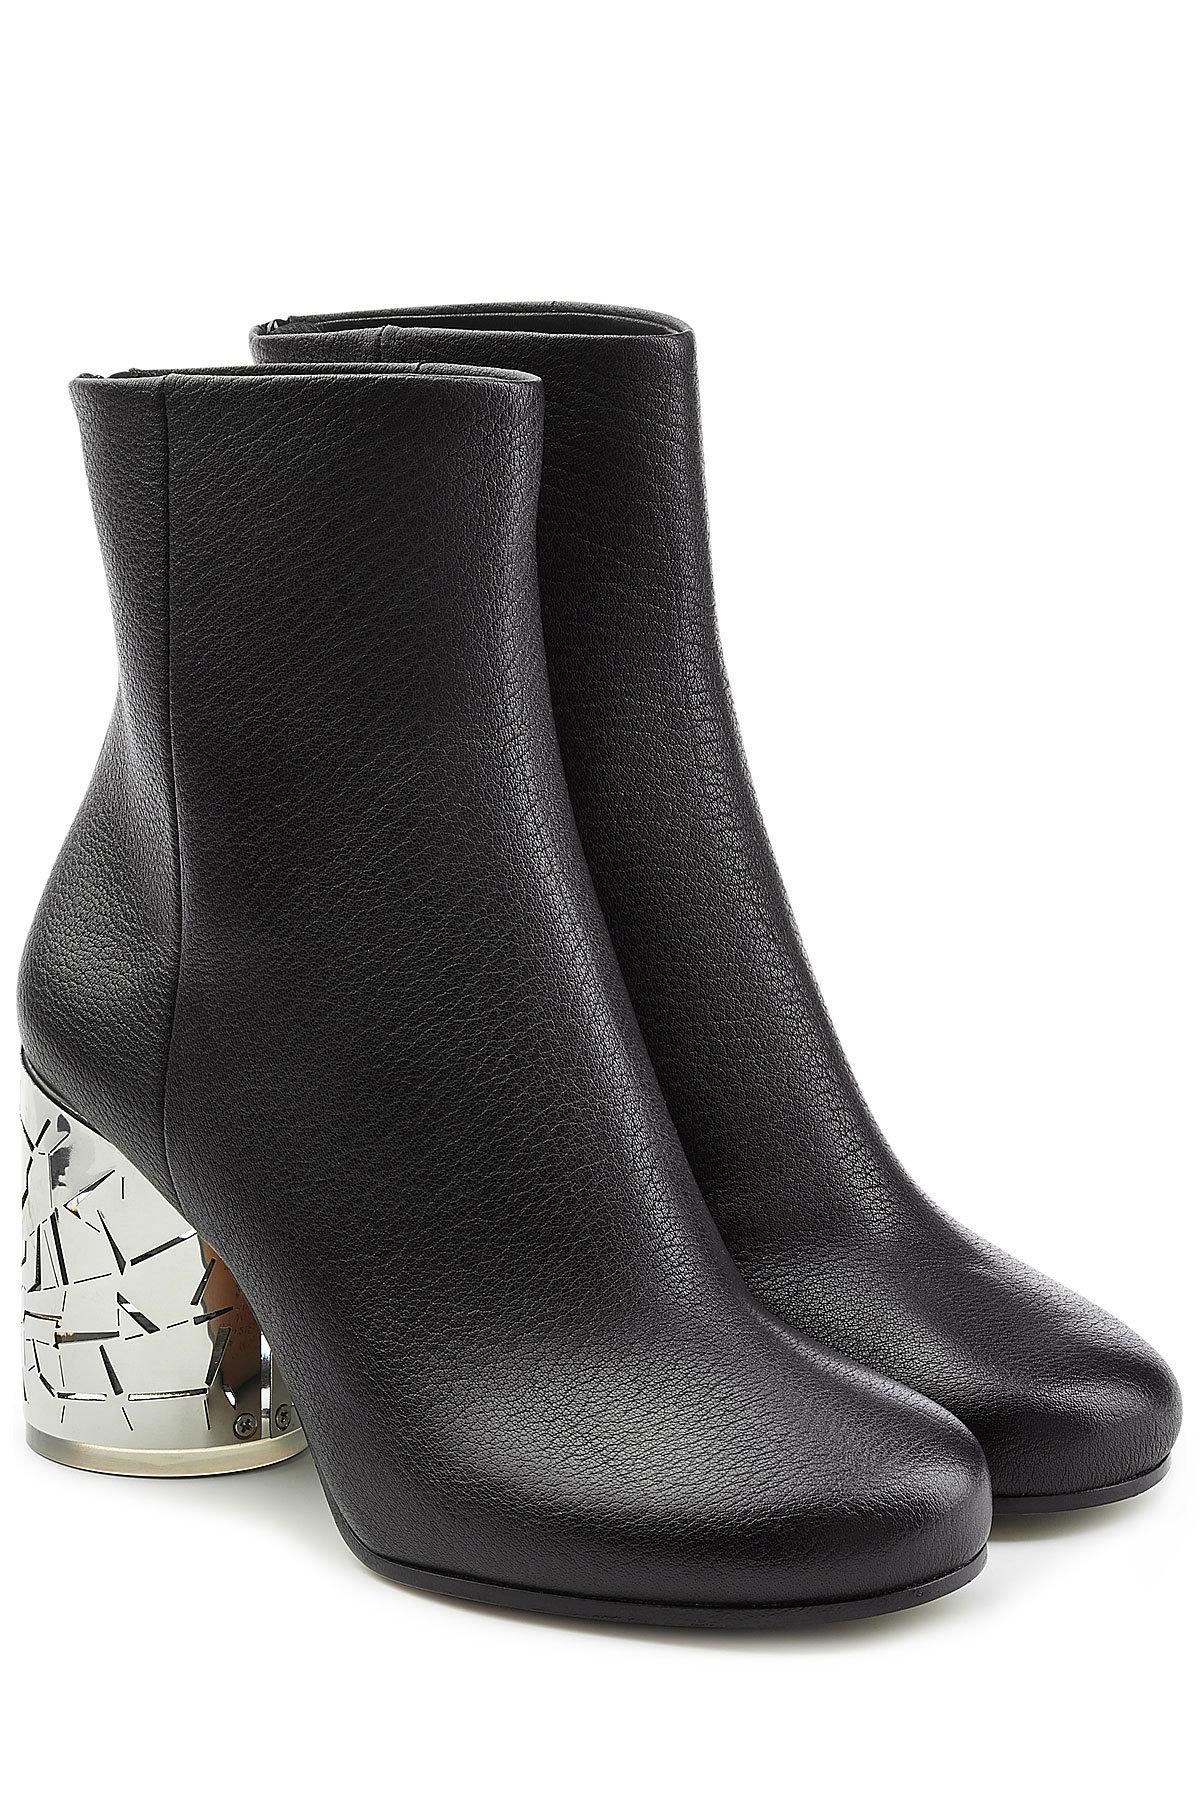 Maison Margiela Leather Ankle Boots with Statement Heel Gr. EU 36 Mv7rf